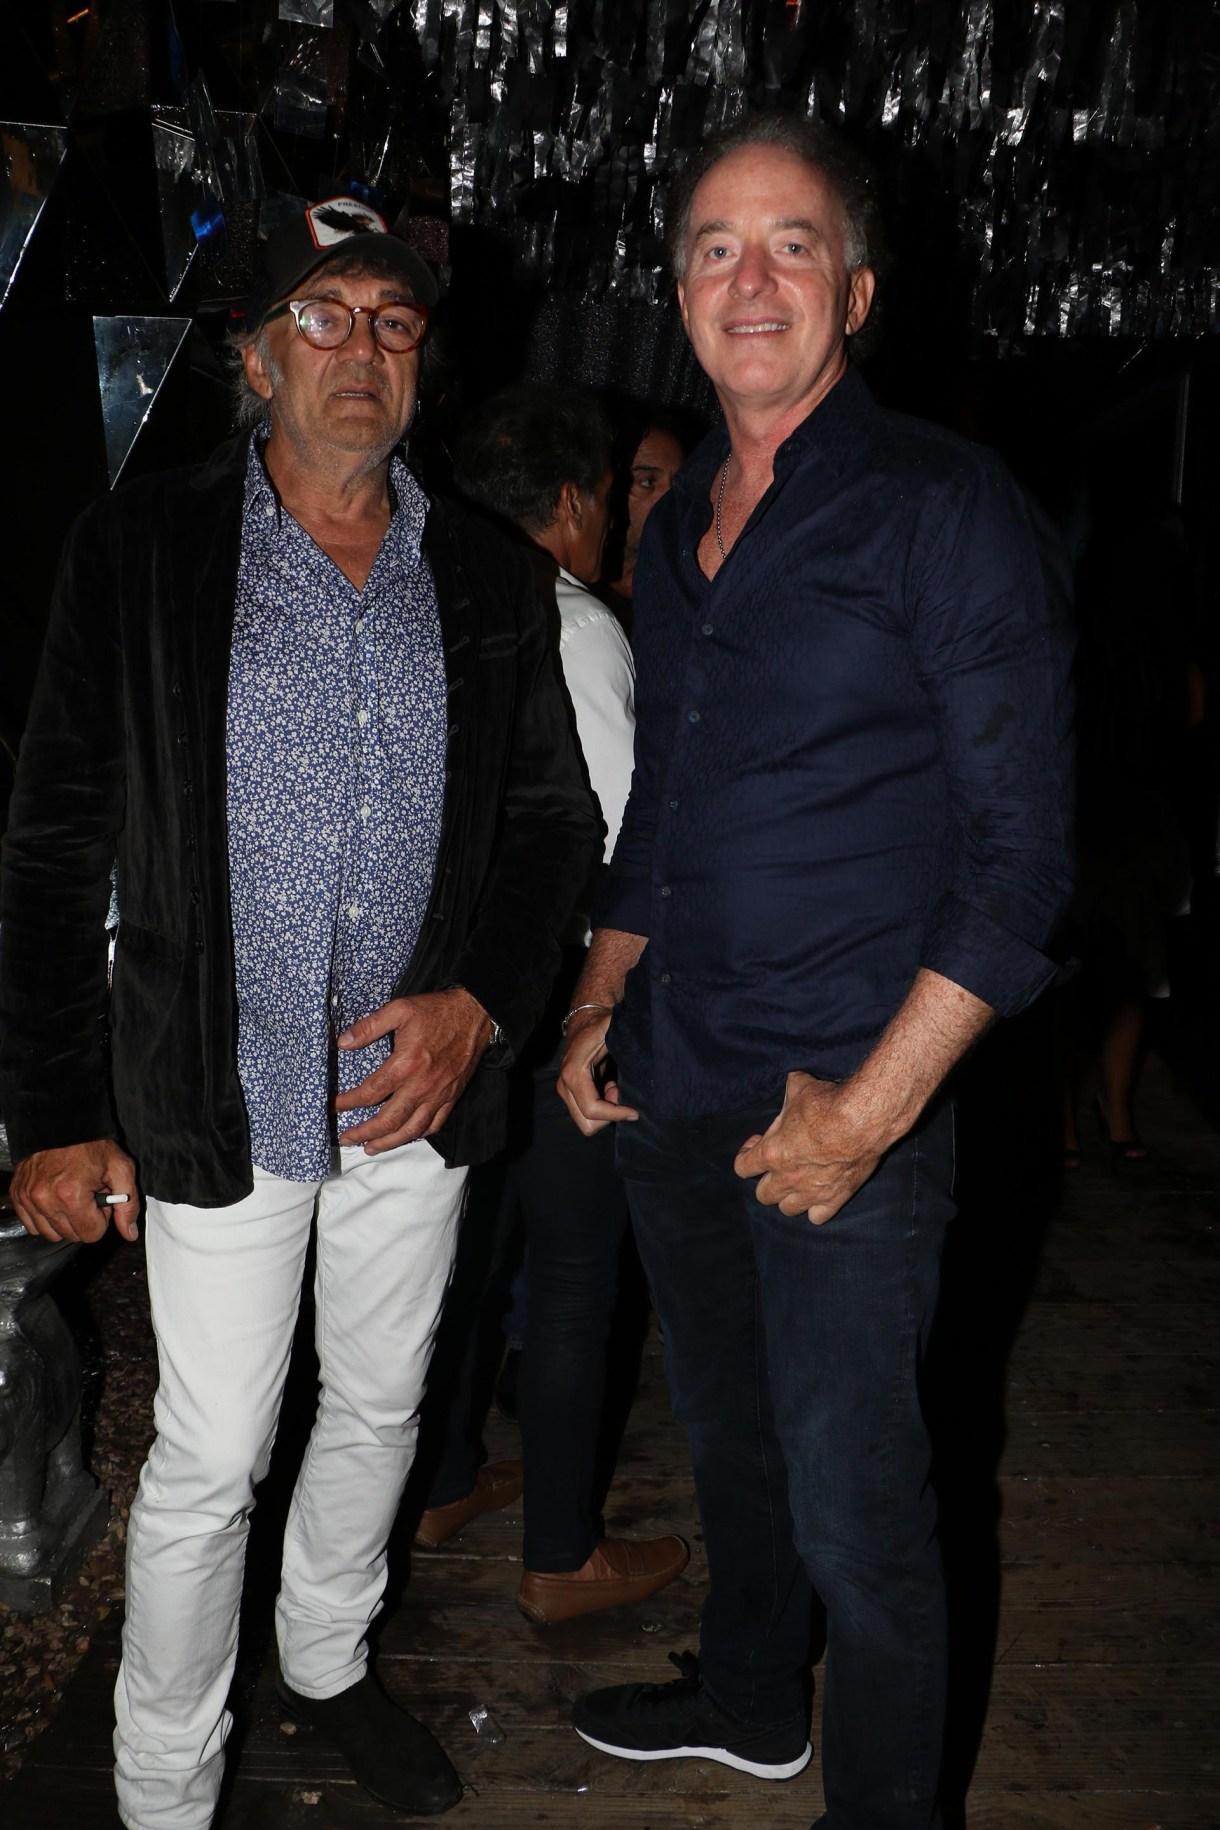 Osvaldo Brucco y Sebastián Eskenazi